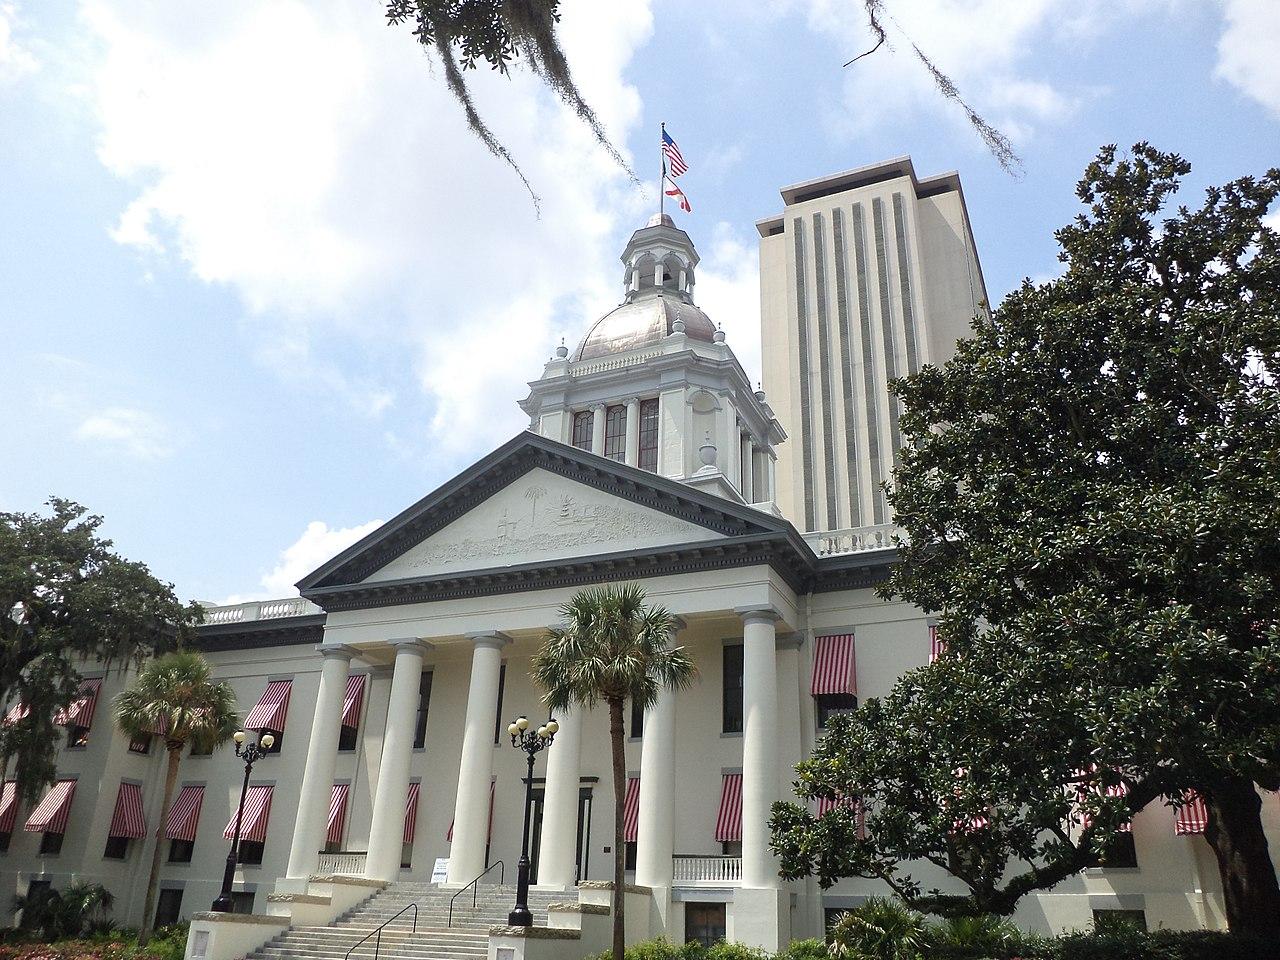 Florida's Historic Capitol and Florida State Capitol, Tallahassee, Leon County, Florida, August 31, 2013. (Michael Rivera/CC-SA-3.0)